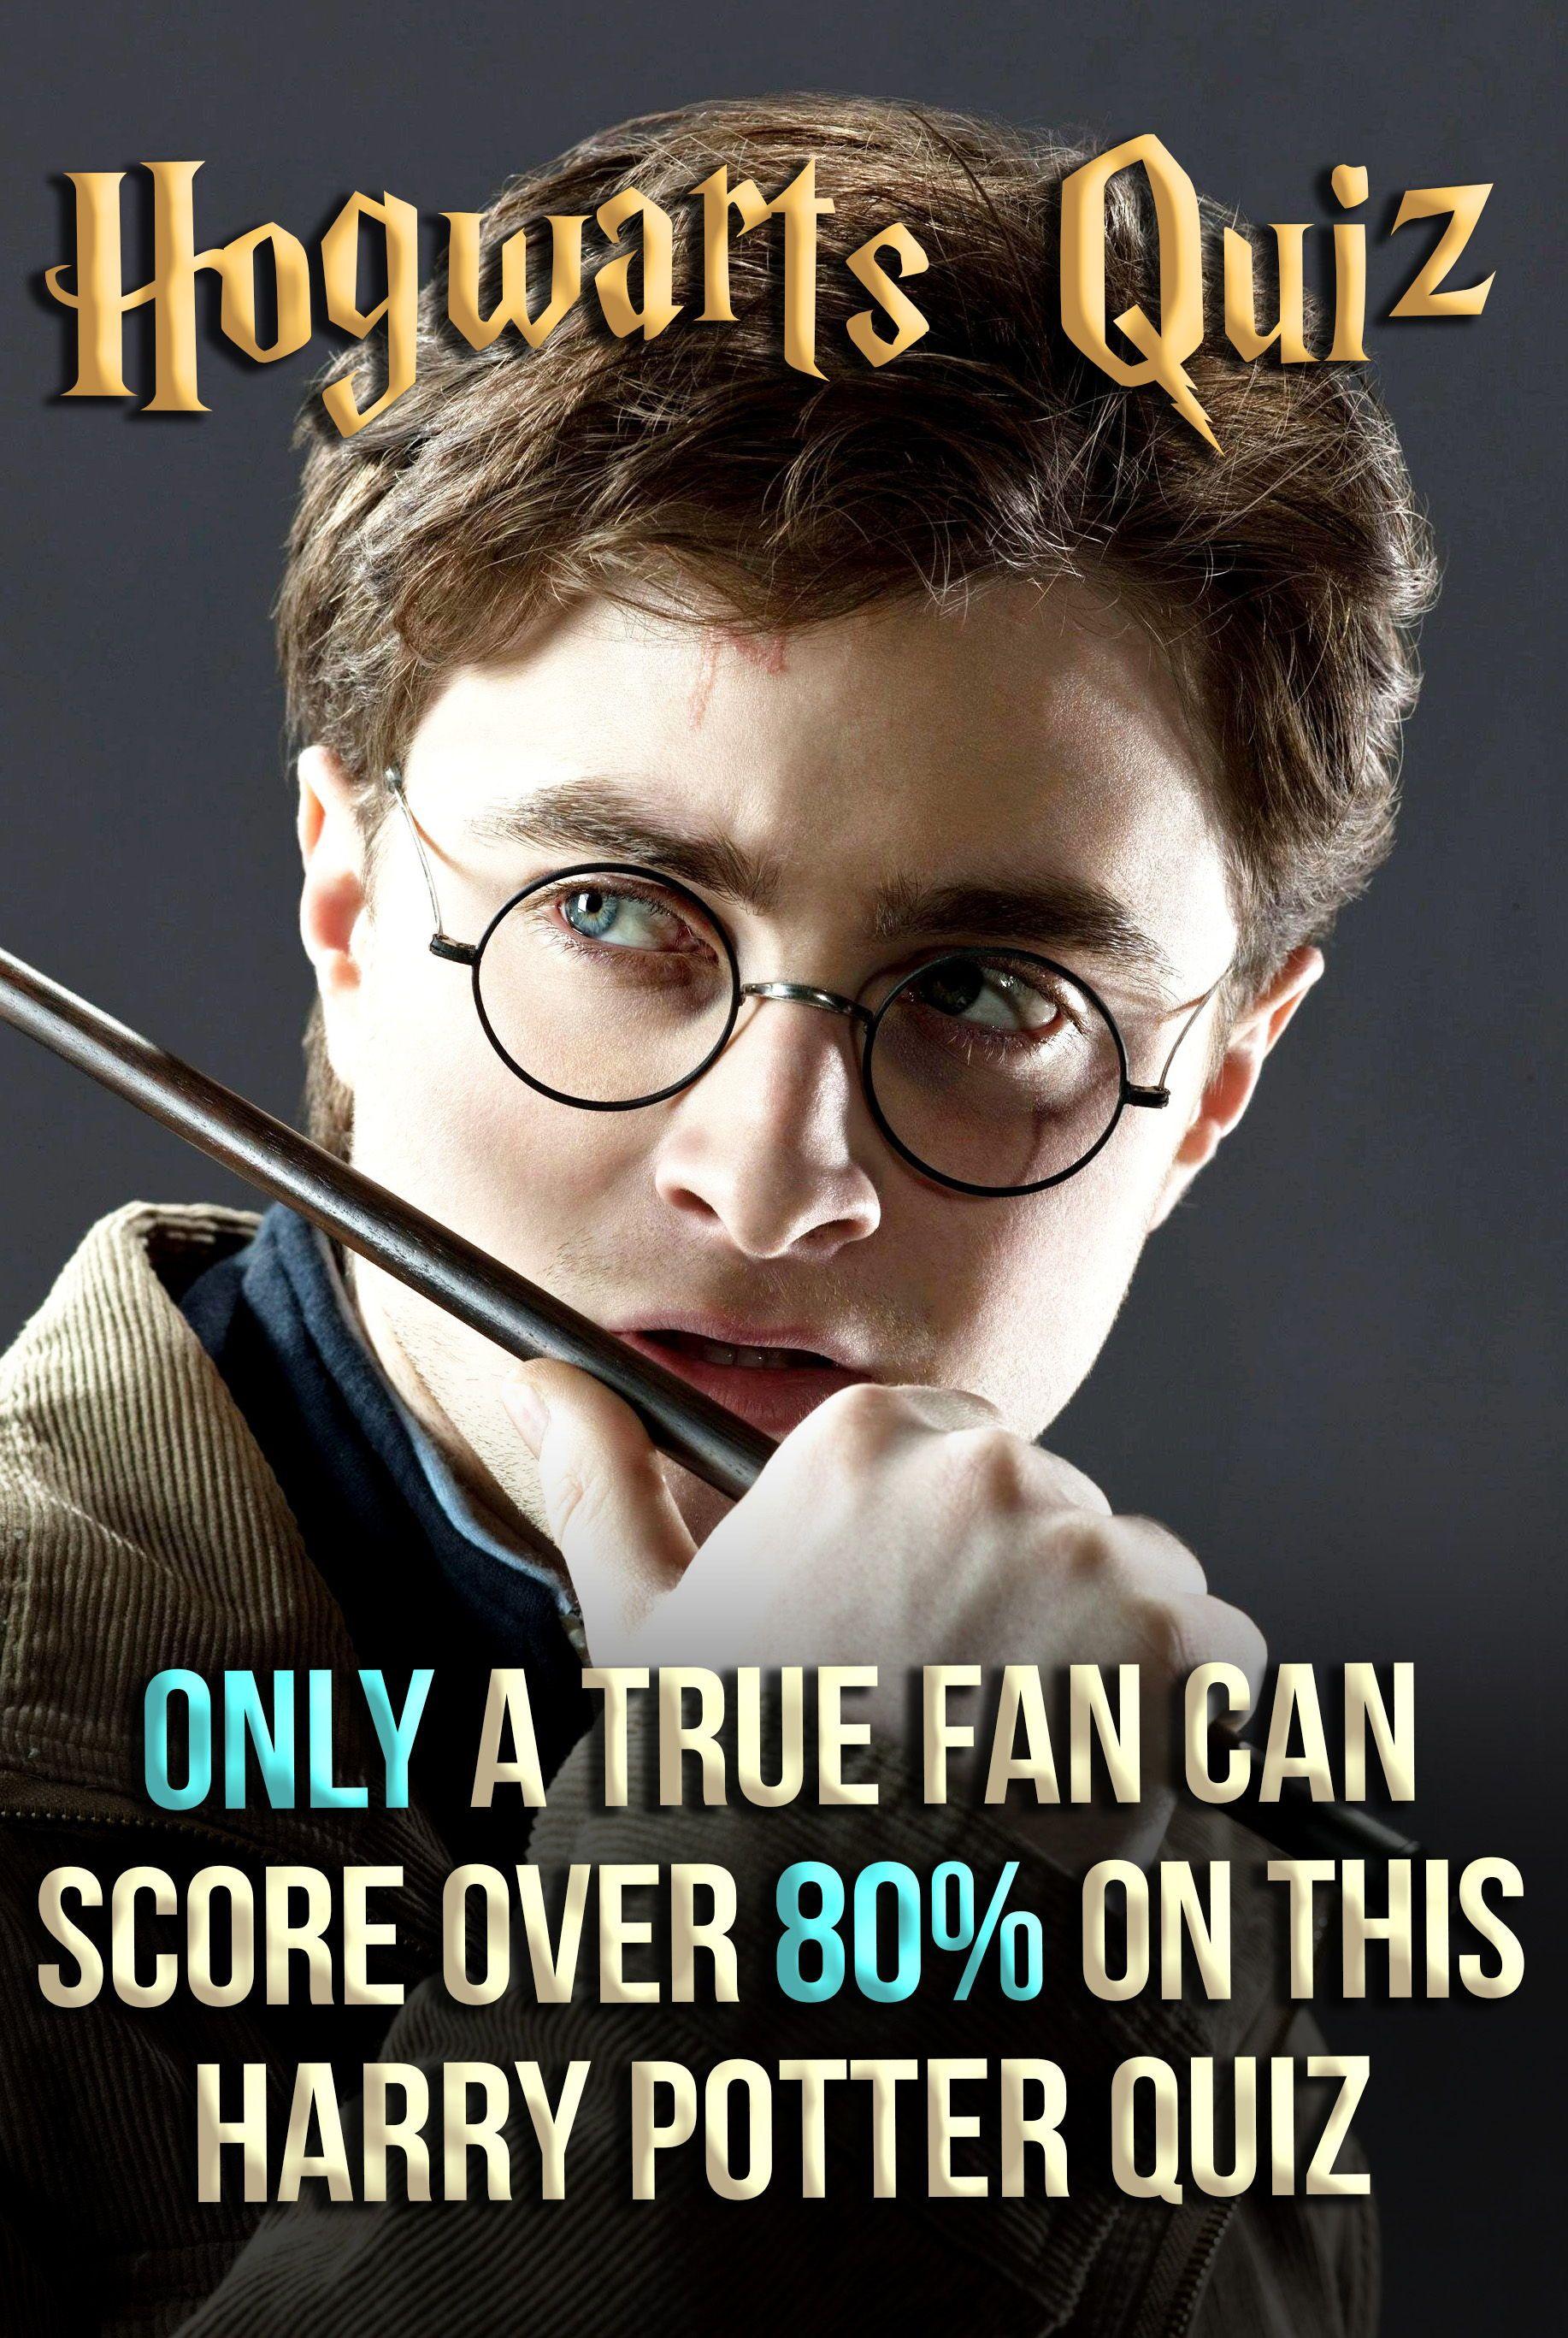 Hogwarts Quiz Only A True Fan Can Score Over 80 On This Harry Potter Quiz Hogwarts Quiz Harry Potter Quiz Harry Potter Trivia Questions